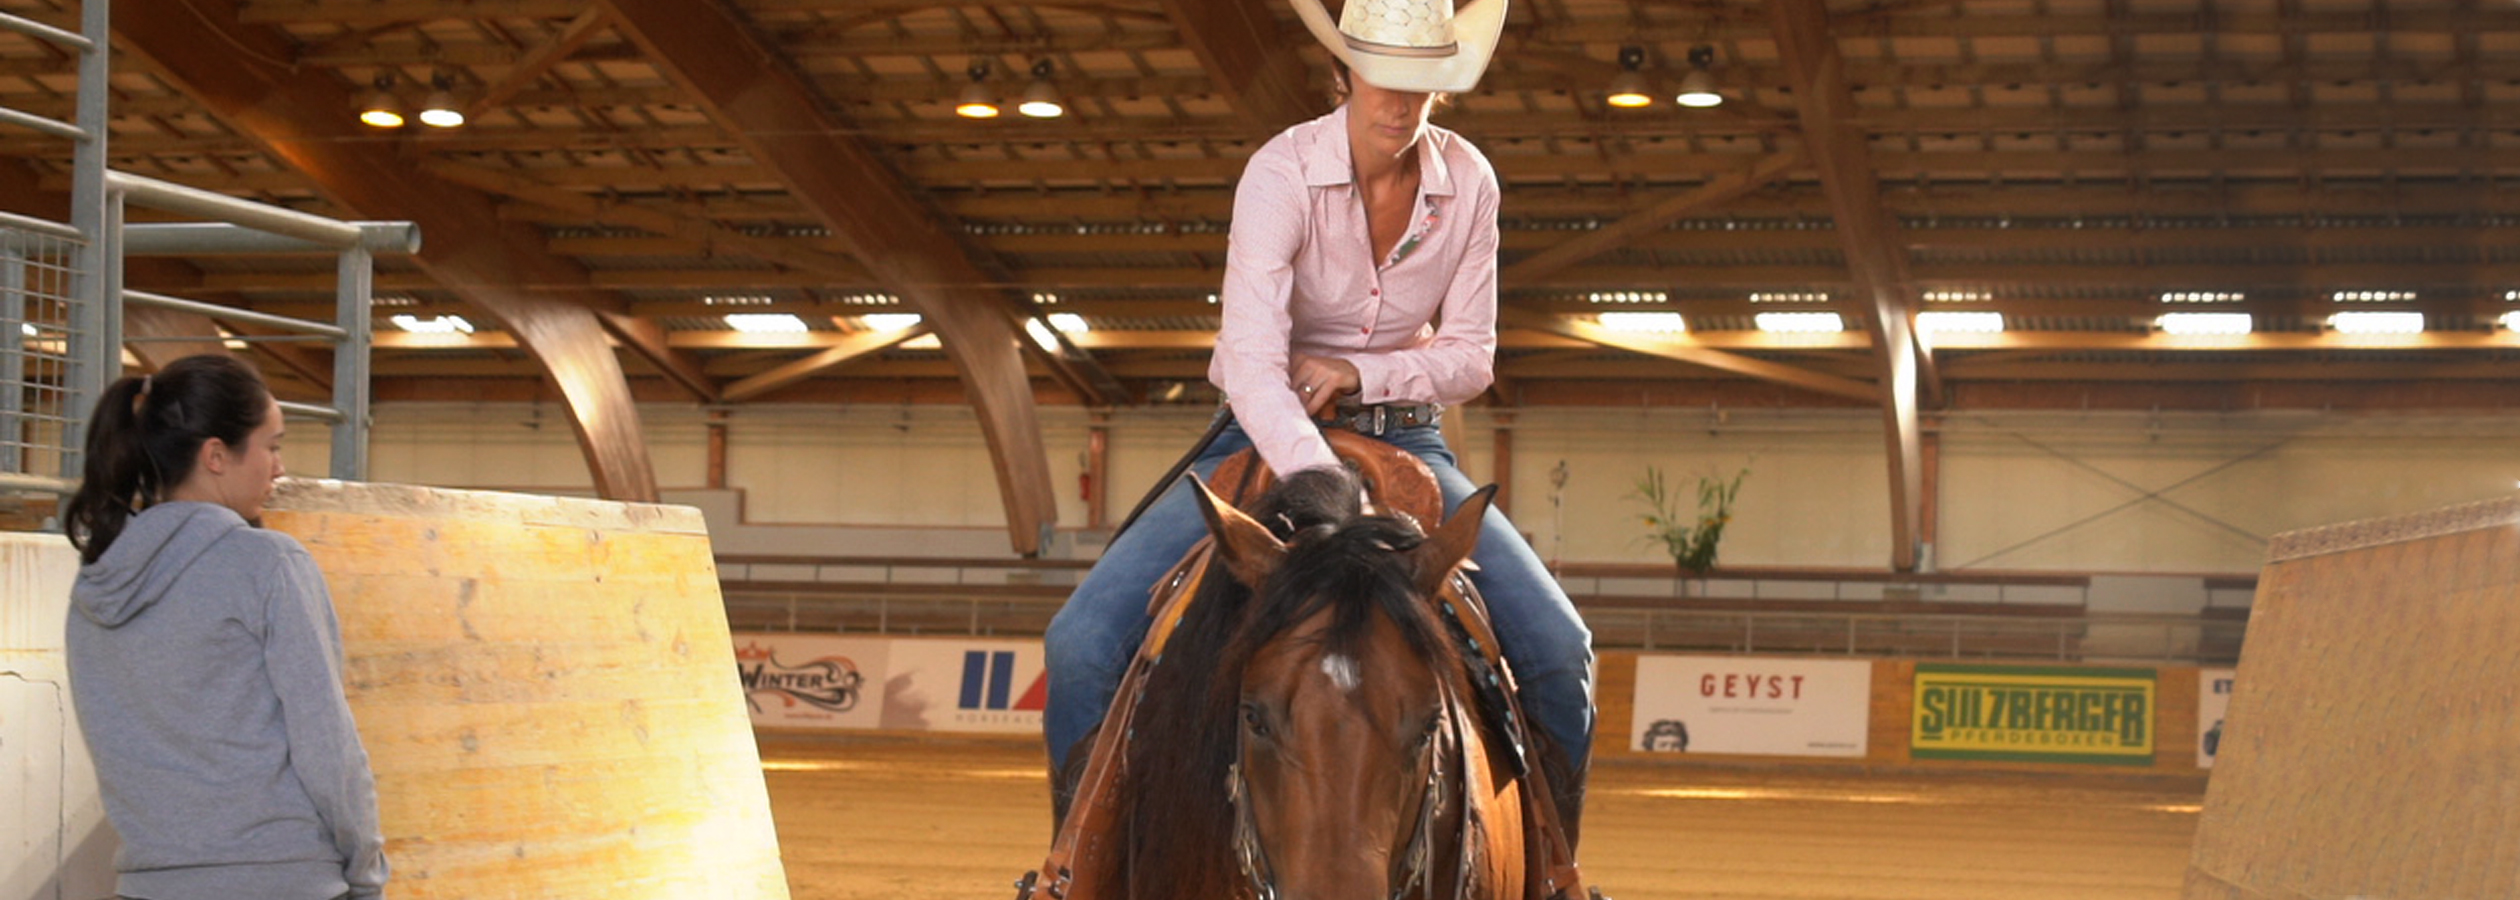 _Header_HorseAcademy_NEU_